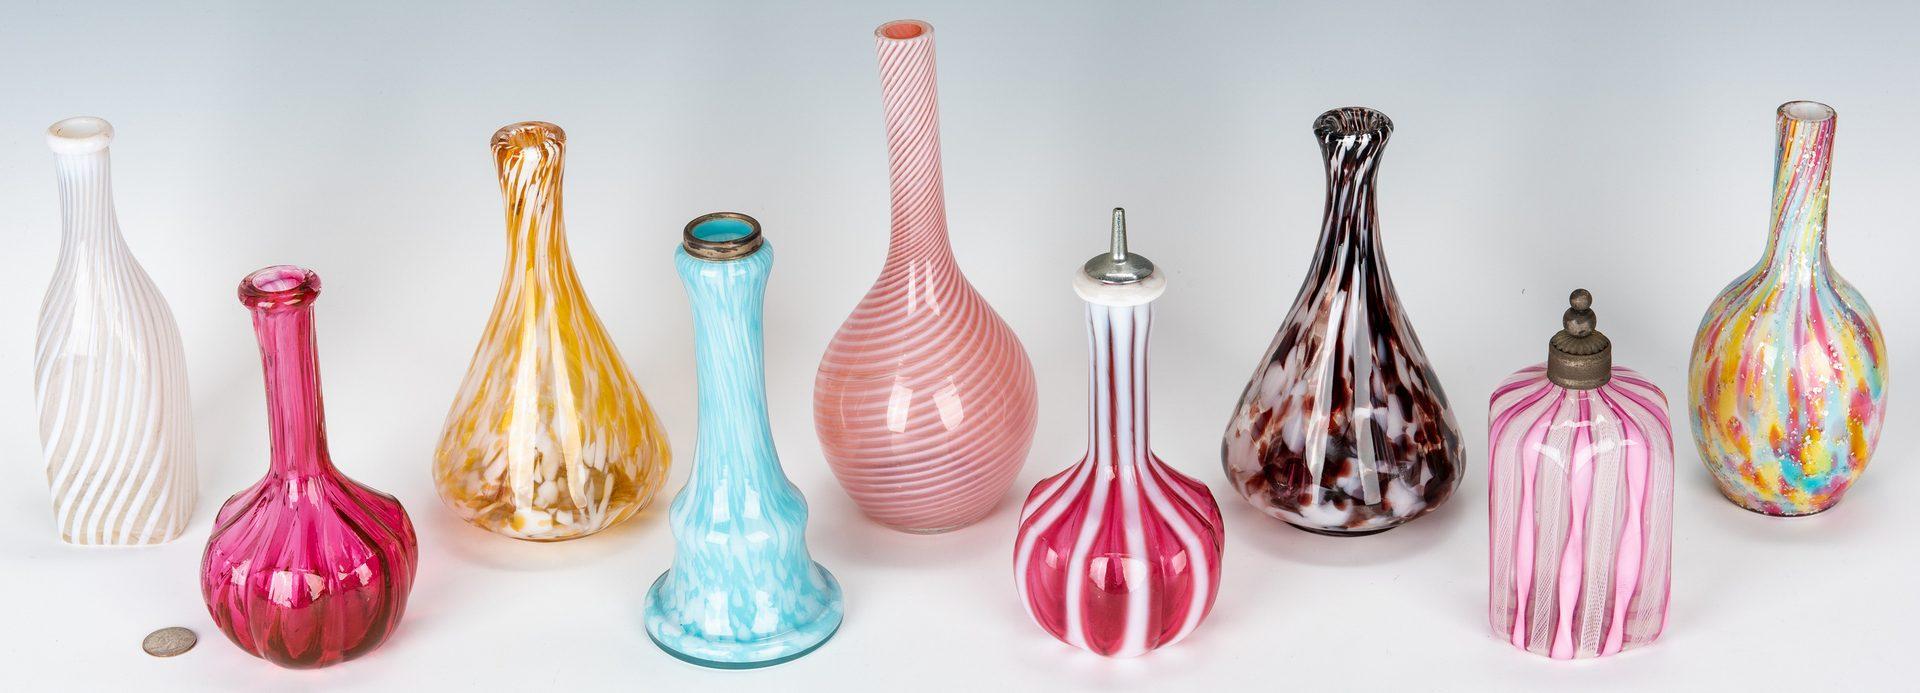 Lot 221: Collection of 15 Art Glass Barber Bottles